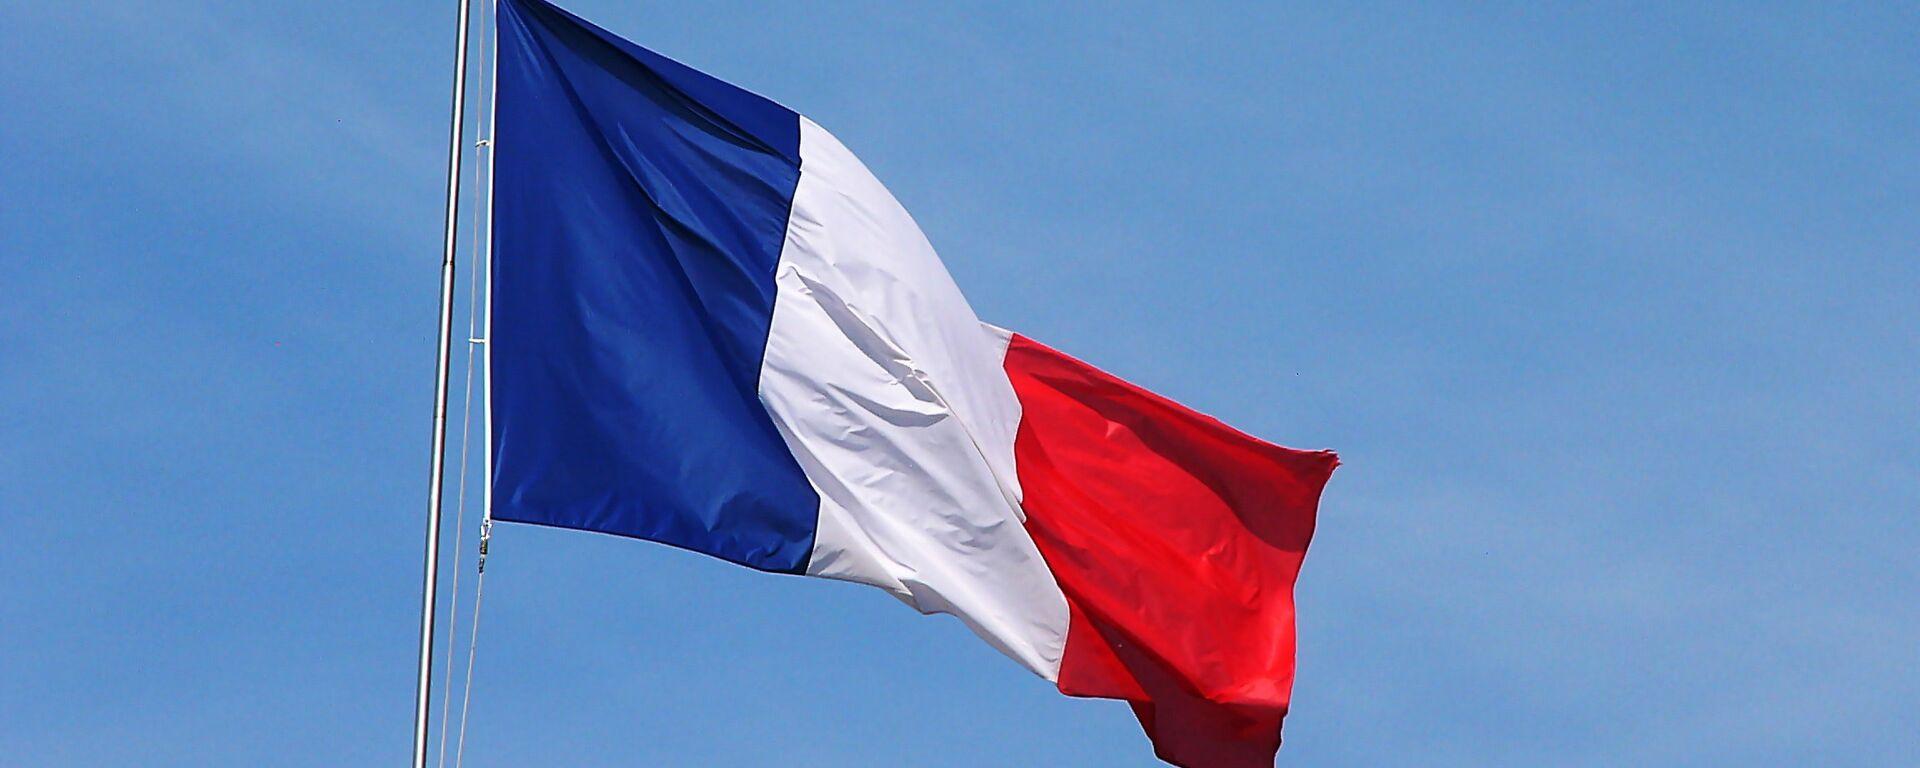 Bandiera francese - Sputnik Italia, 1920, 16.09.2021